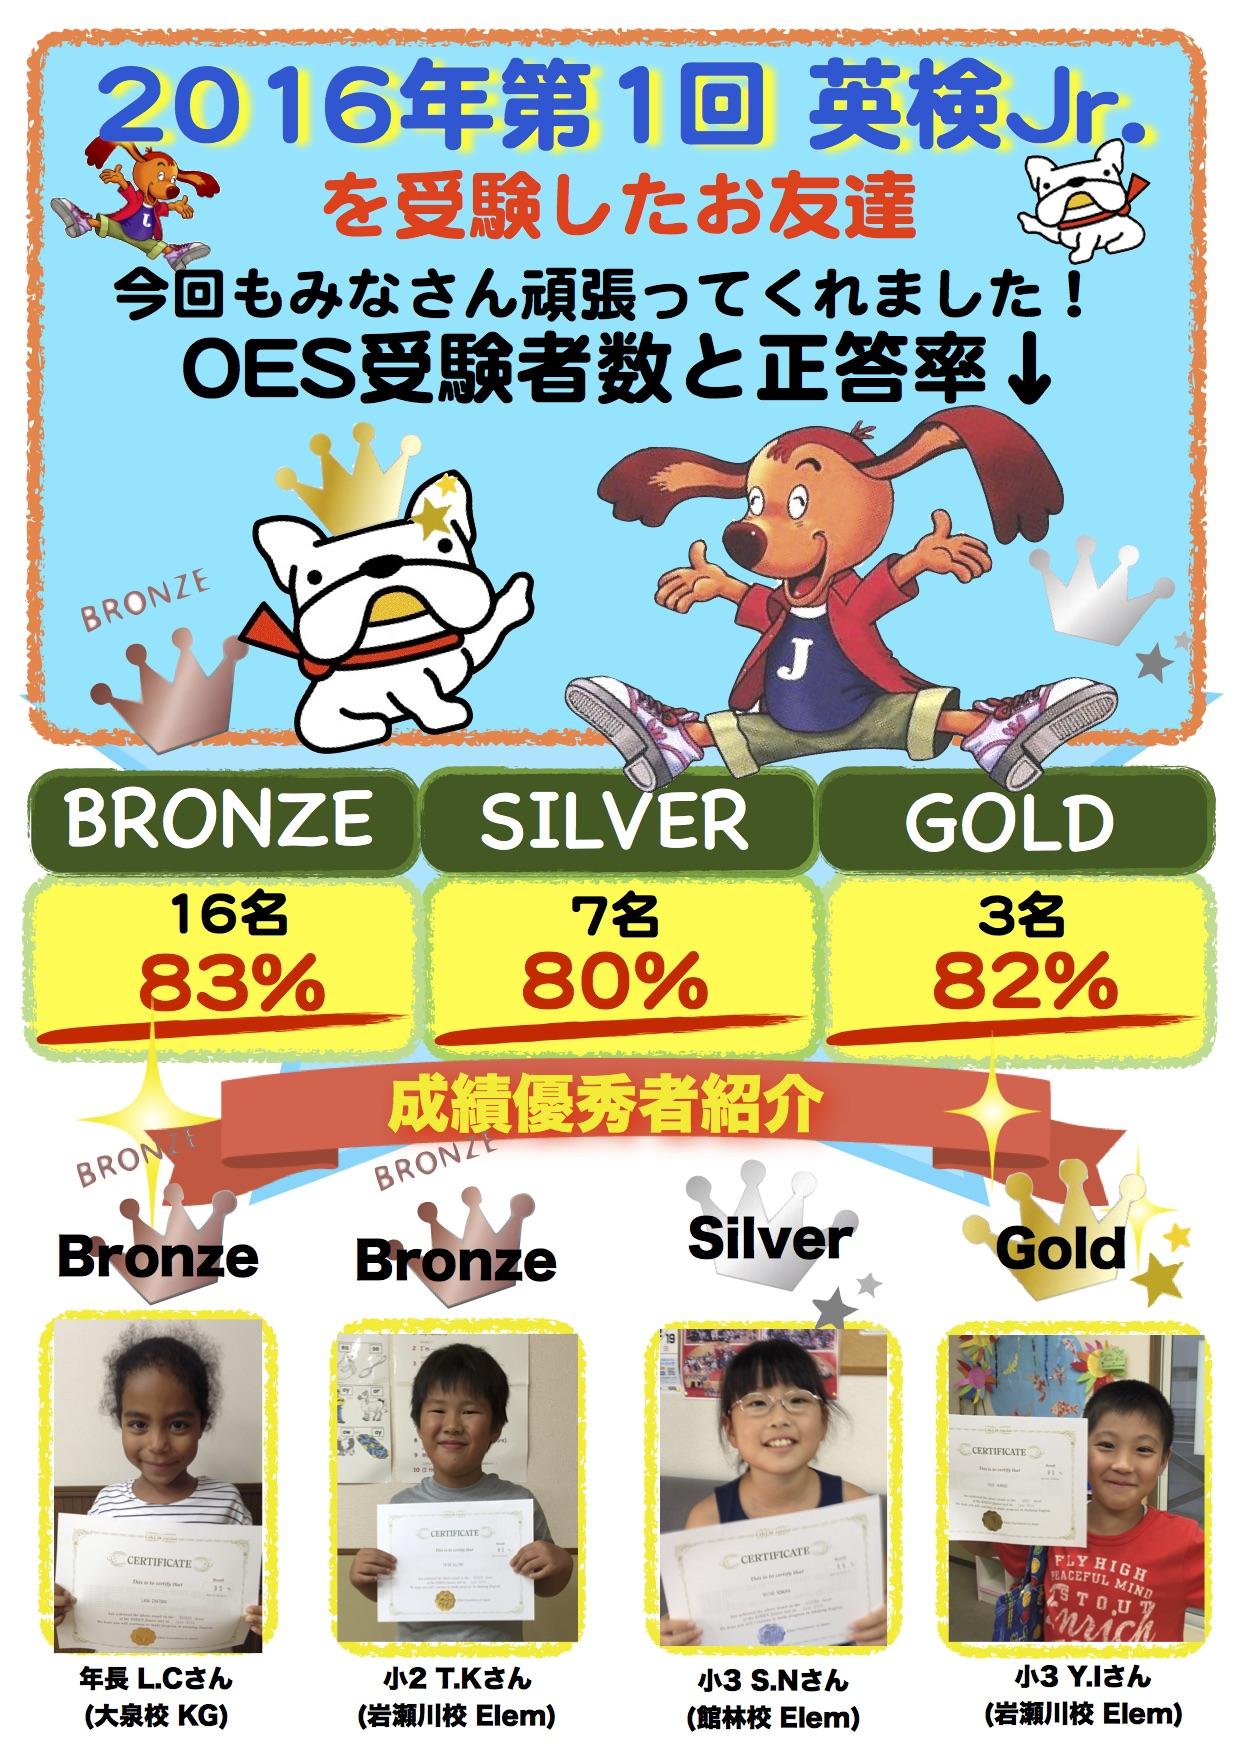 ②HP用:生徒写真入り 2016-1回英検Jr. 結果報告 ポスター